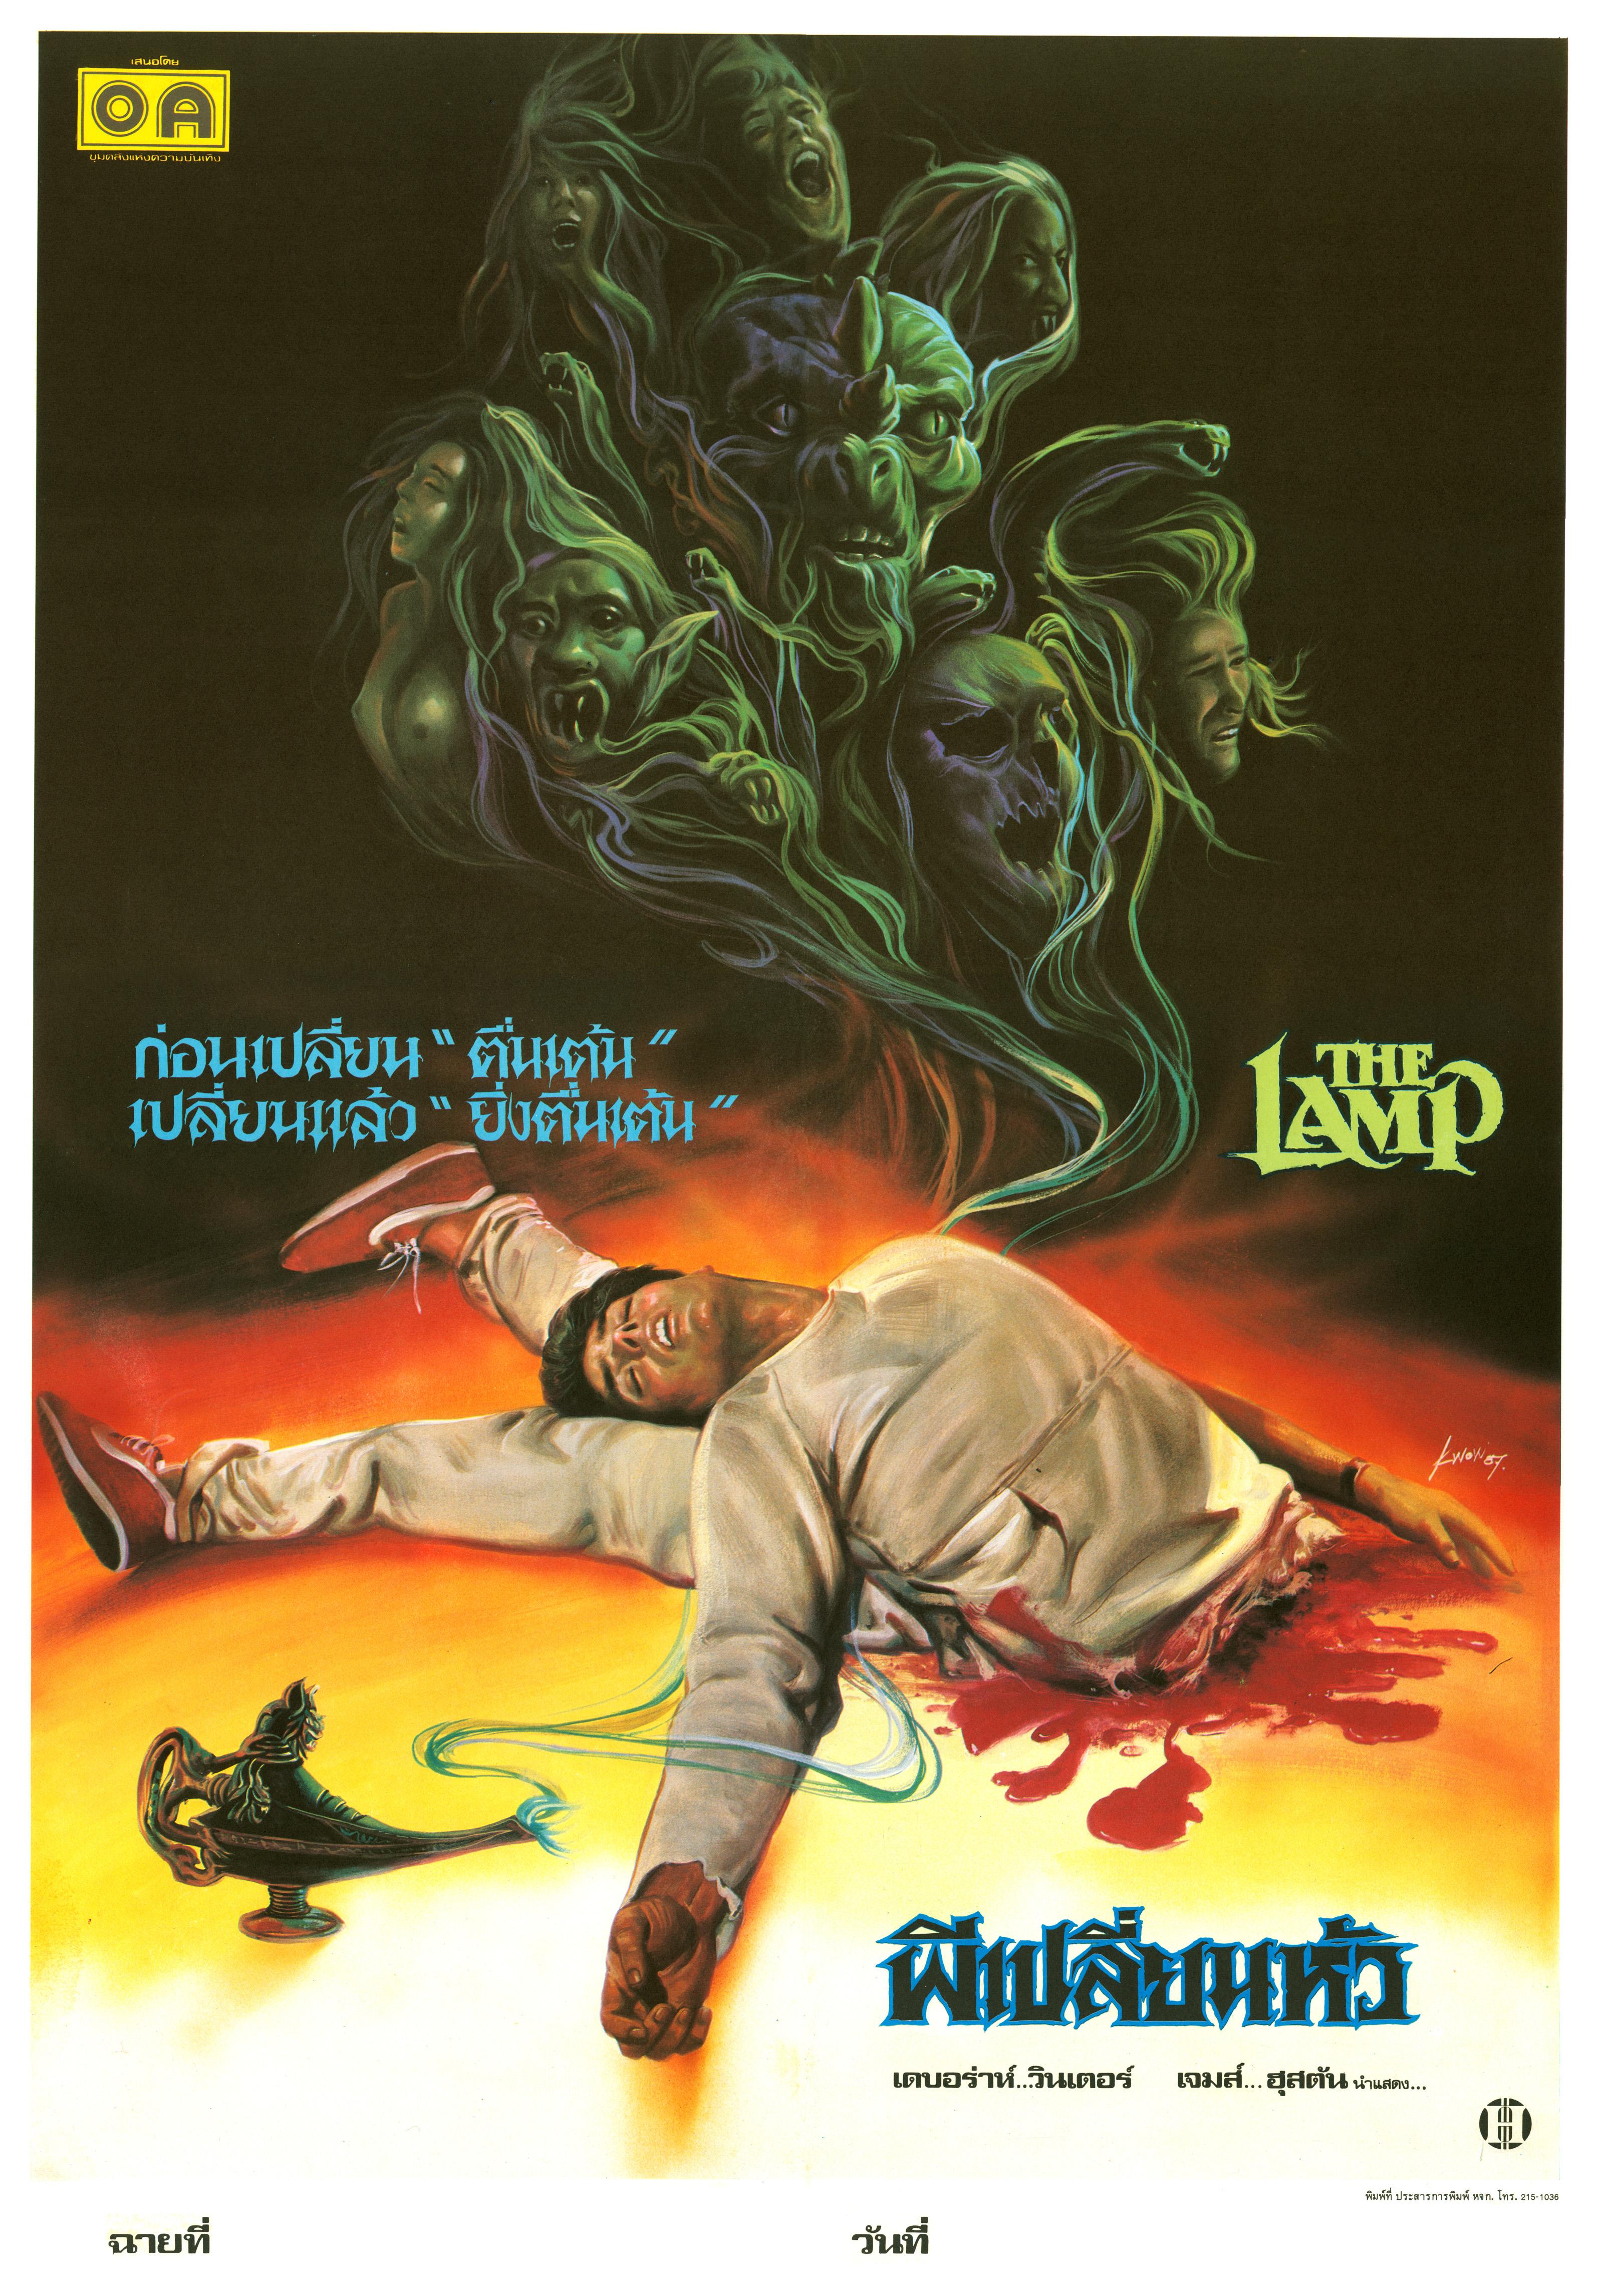 The Lamp aka The Outing (1986) – HORRORPEDIA